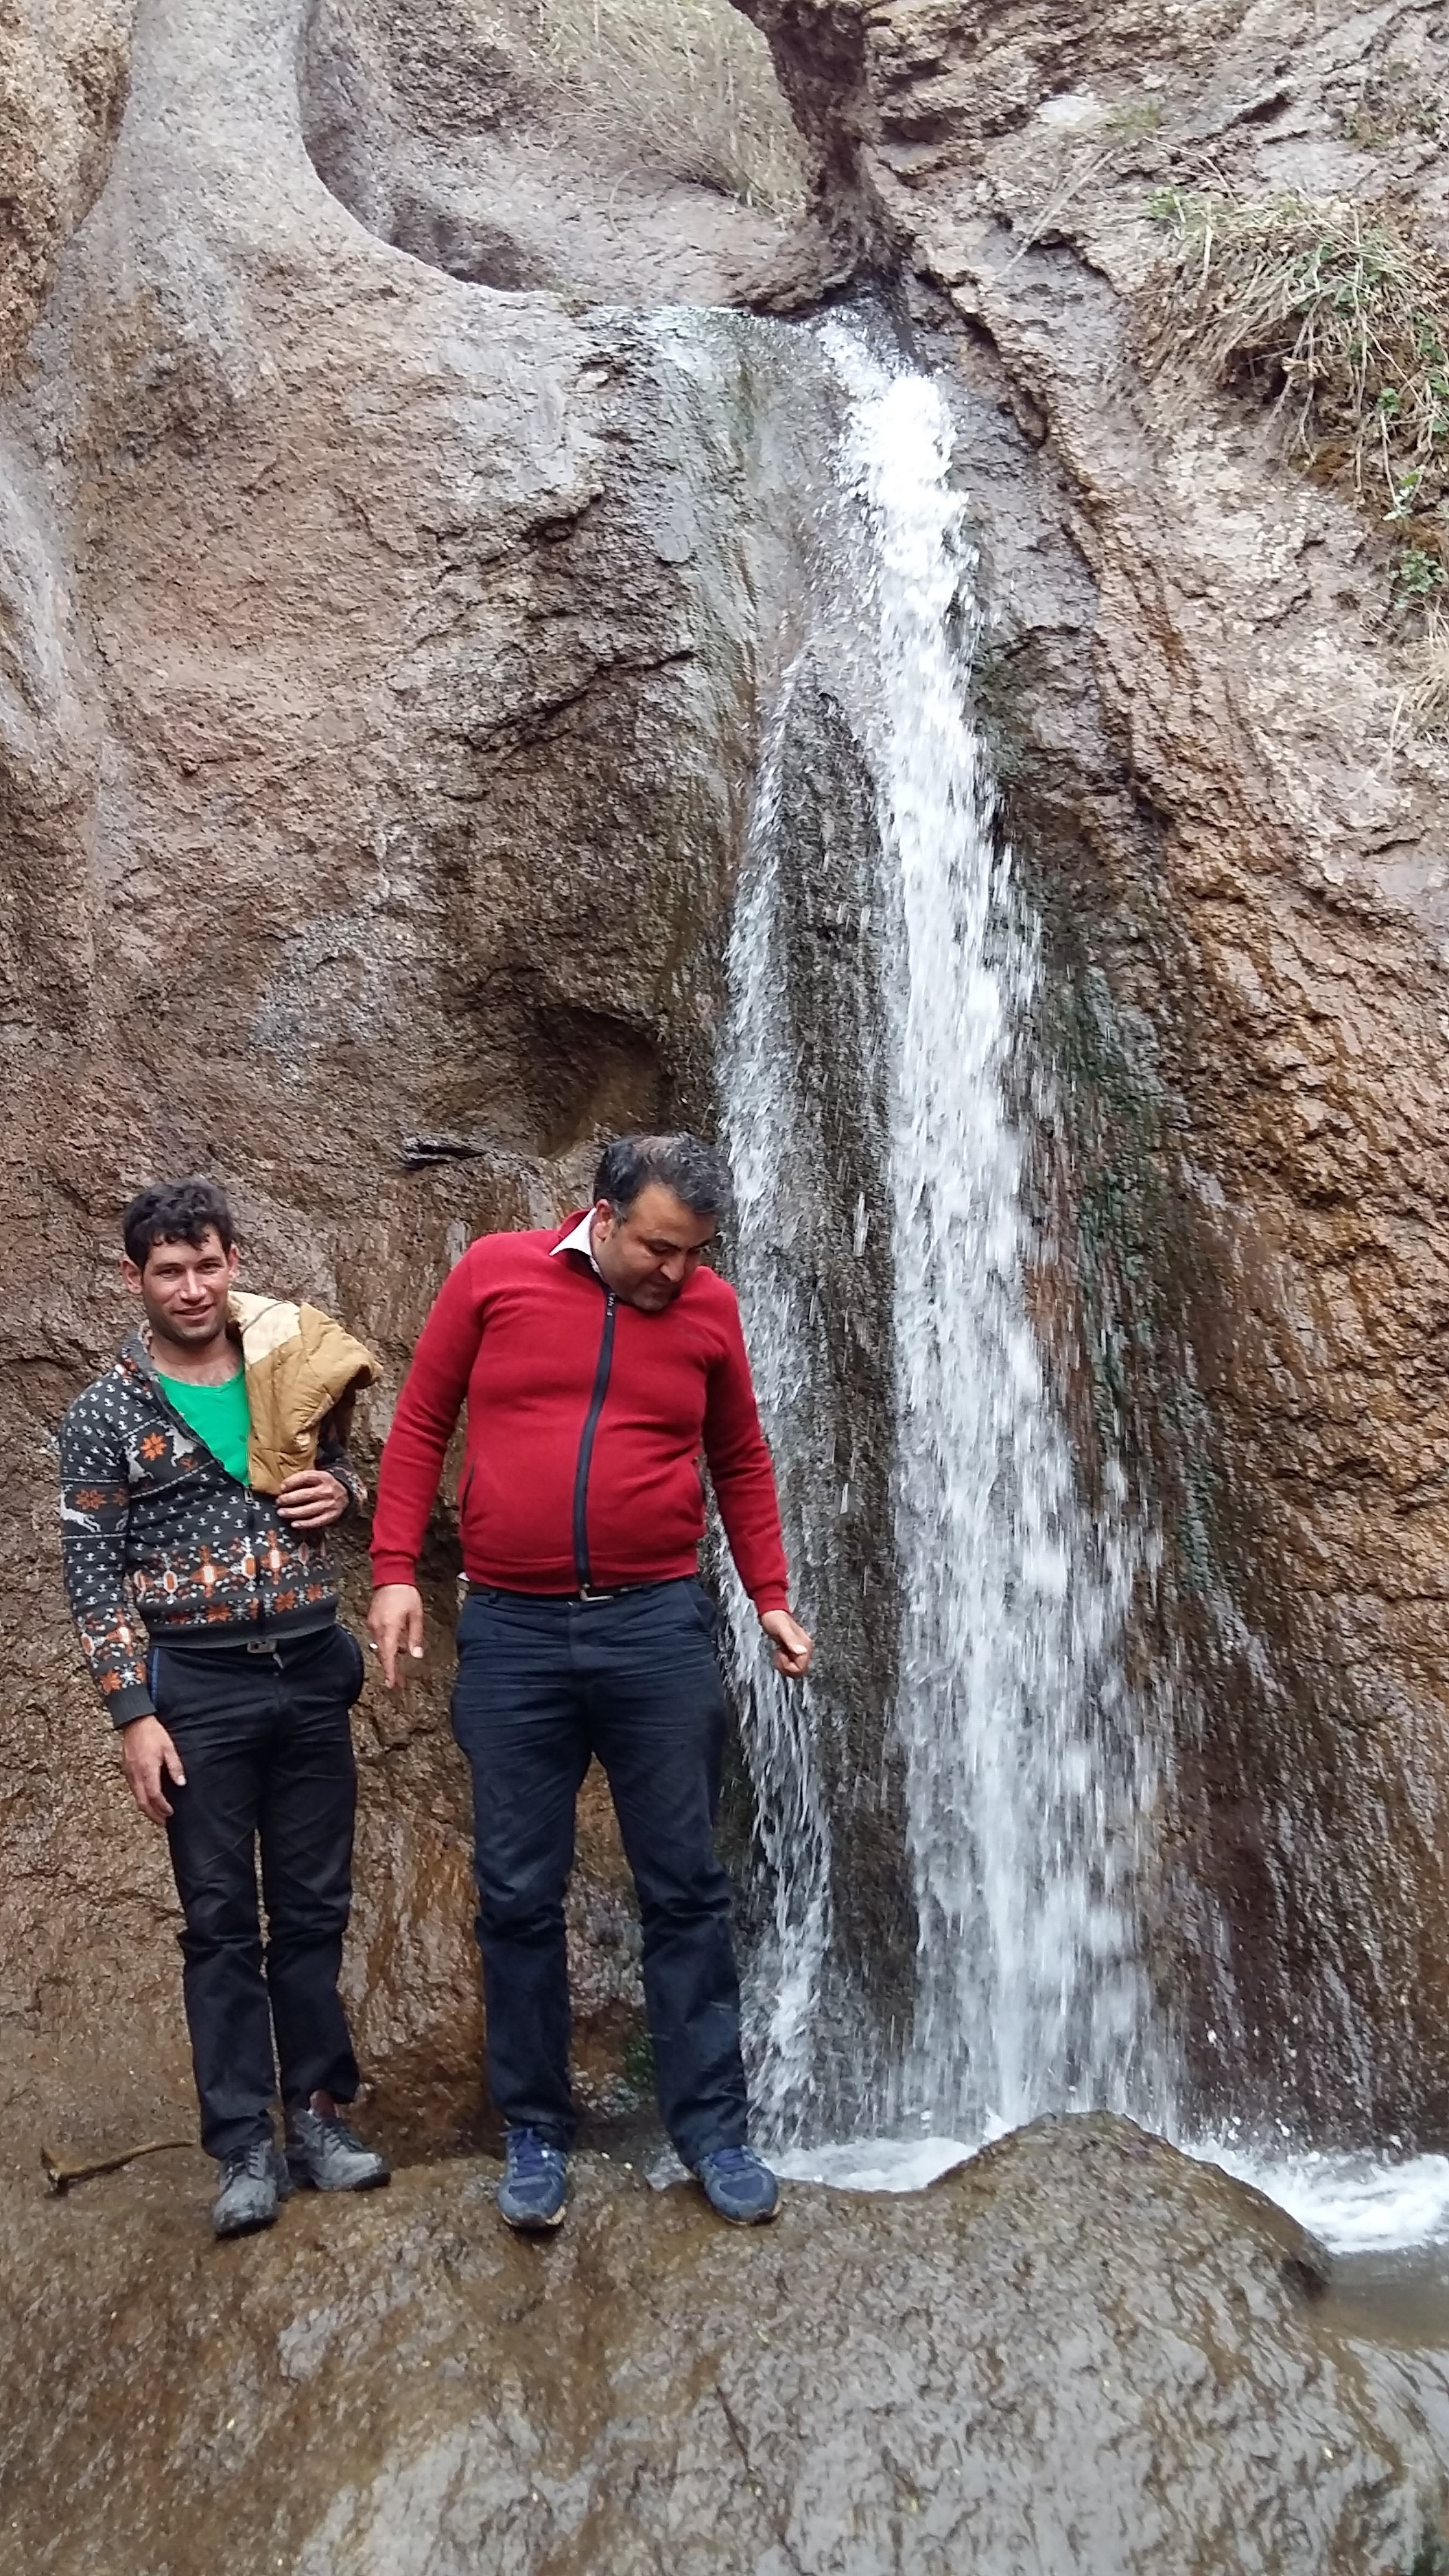 آبشار بودالالو